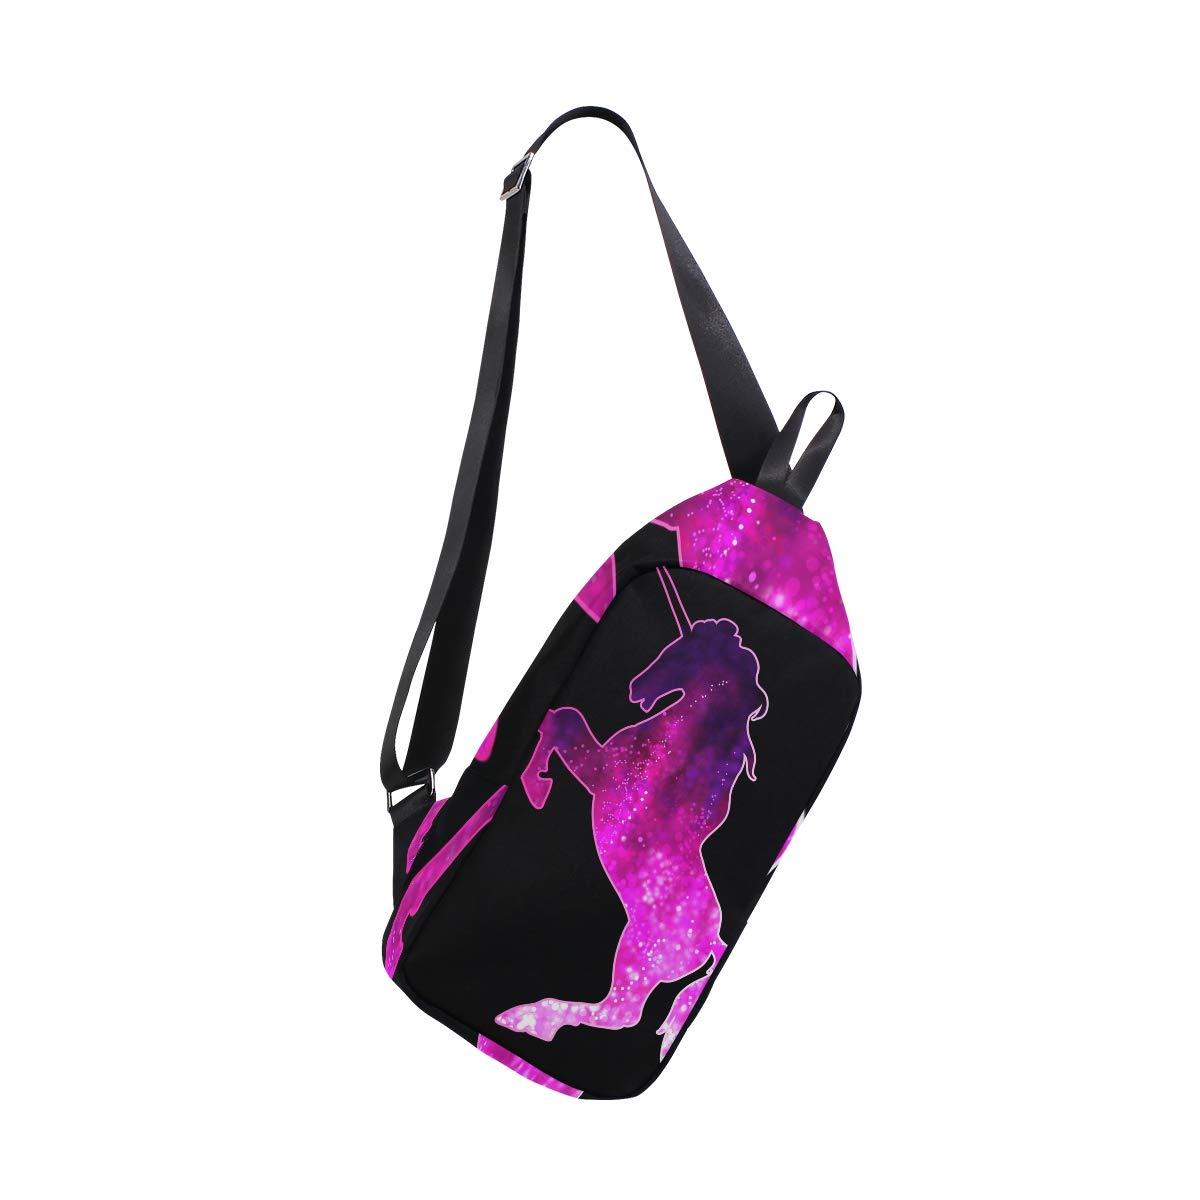 TFONE Unicorn Pattern Crossbody Bag Lightweight Chest Shoulder Messenger Pack Backpack Sling Bag